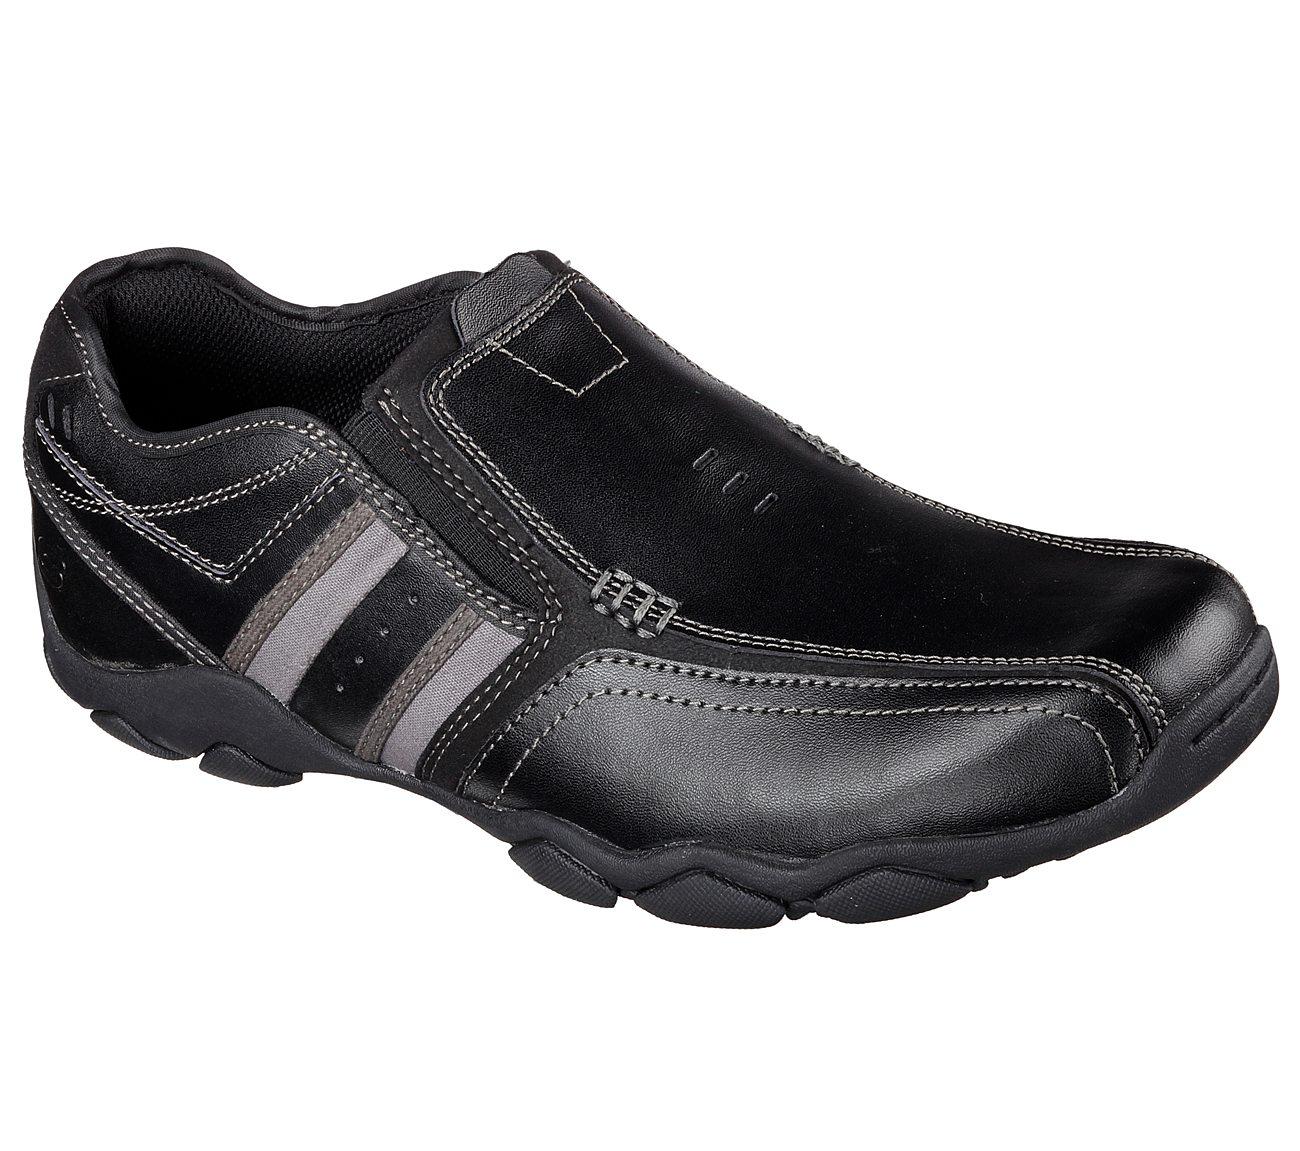 b6b7ccd21501 Buy SKECHERS Diameter - Zinroy Modern Comfort Shoes only  75.00